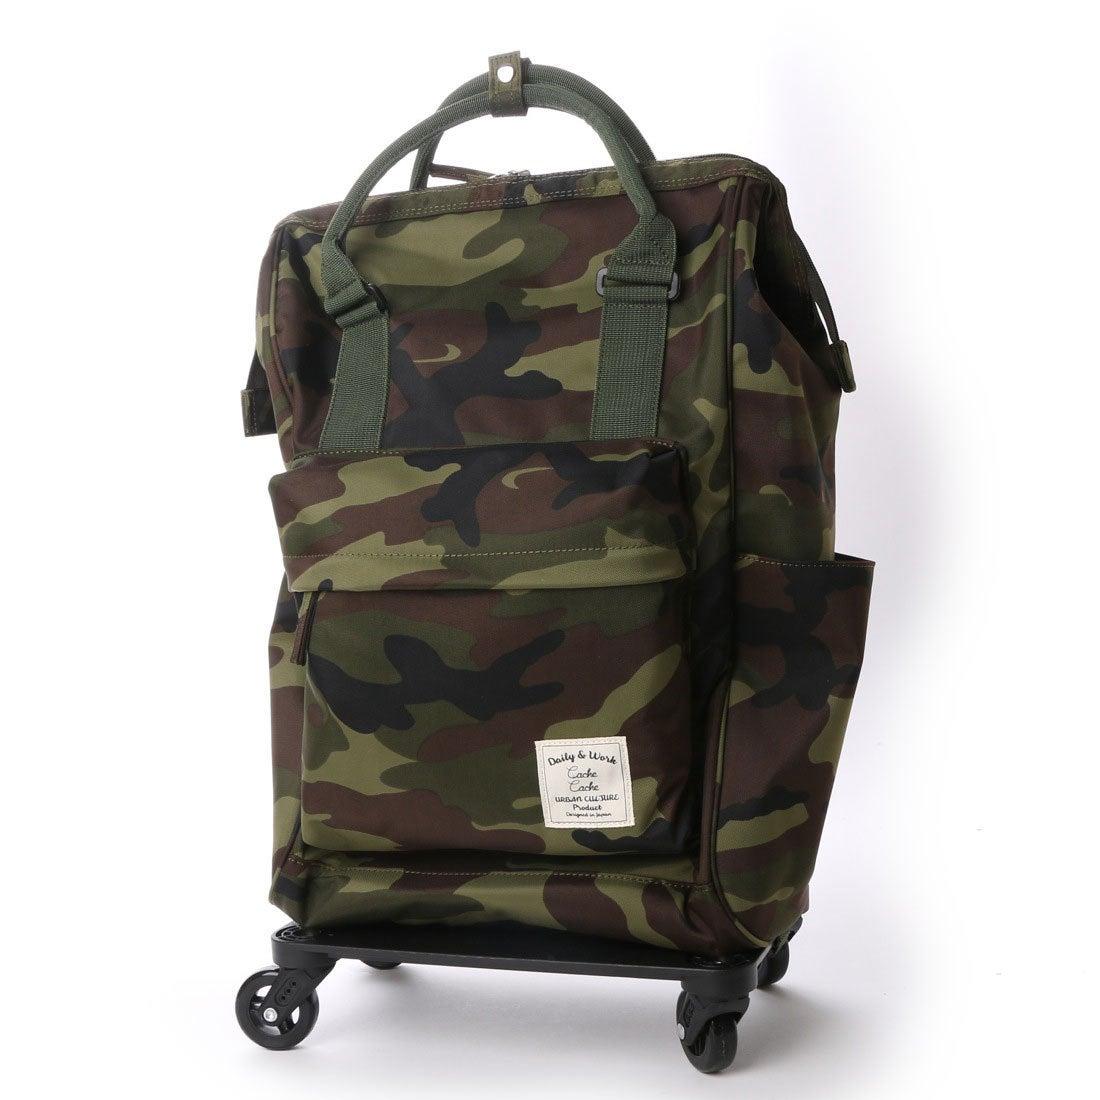 300506f8ae55 カシュカシュ cache cache 口枠リュック型キャリーバッグ (カモフラ) -靴&ファッション通販 ロコンド〜自宅で試着、気軽に返品